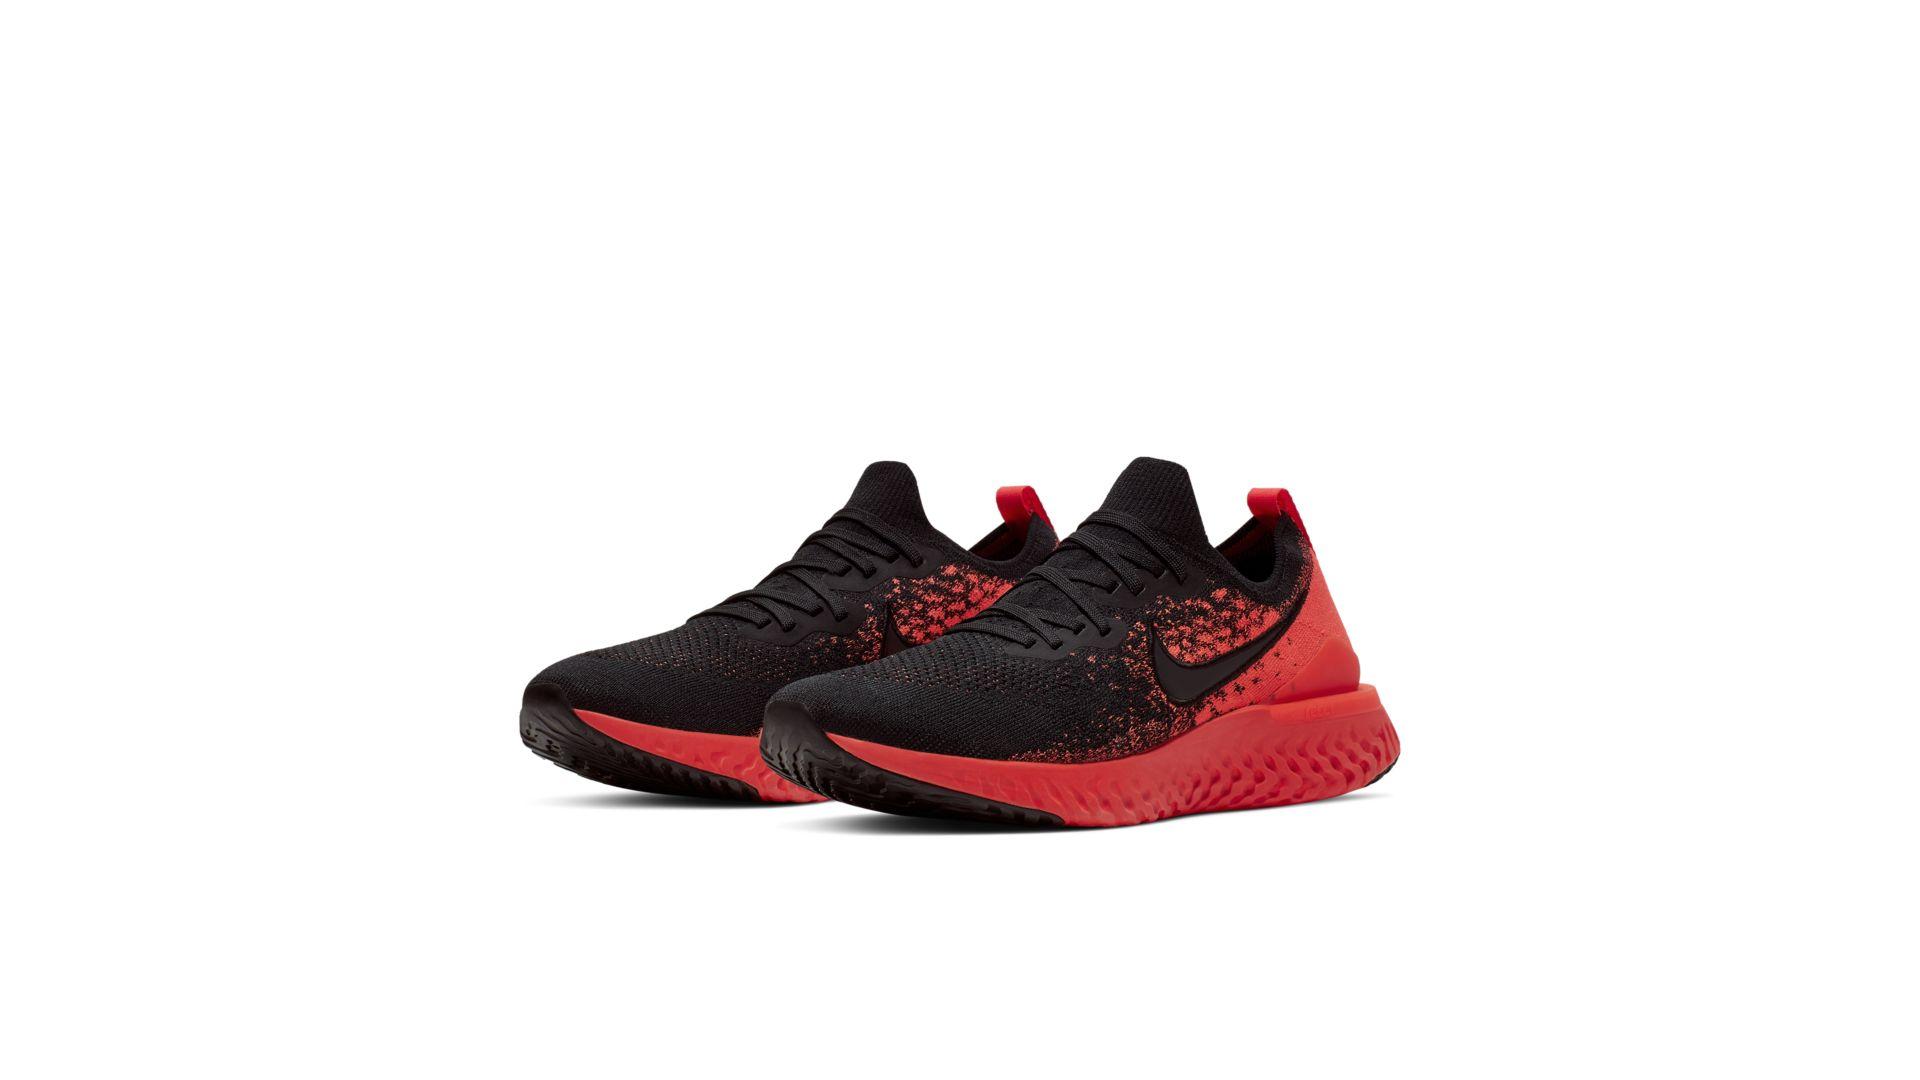 Nike Epic React Flyknit 2 Black Bright Crimson Infrared (BQ8928-008)